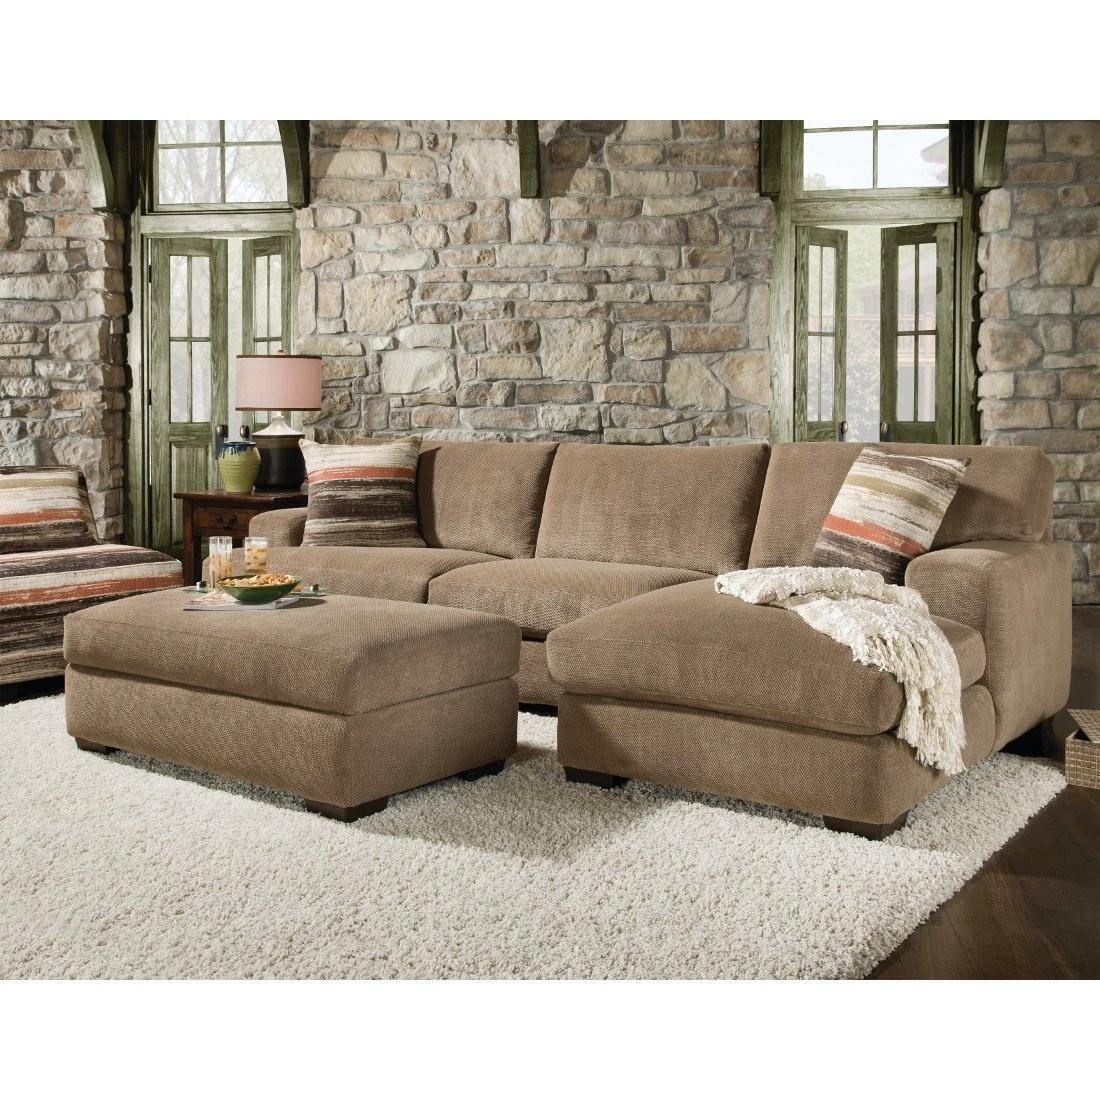 Sofas Center : Down Filled Sofa Kreiss Sectional Sofadowndown And For Down Filled Sofa Sectional (View 4 of 15)